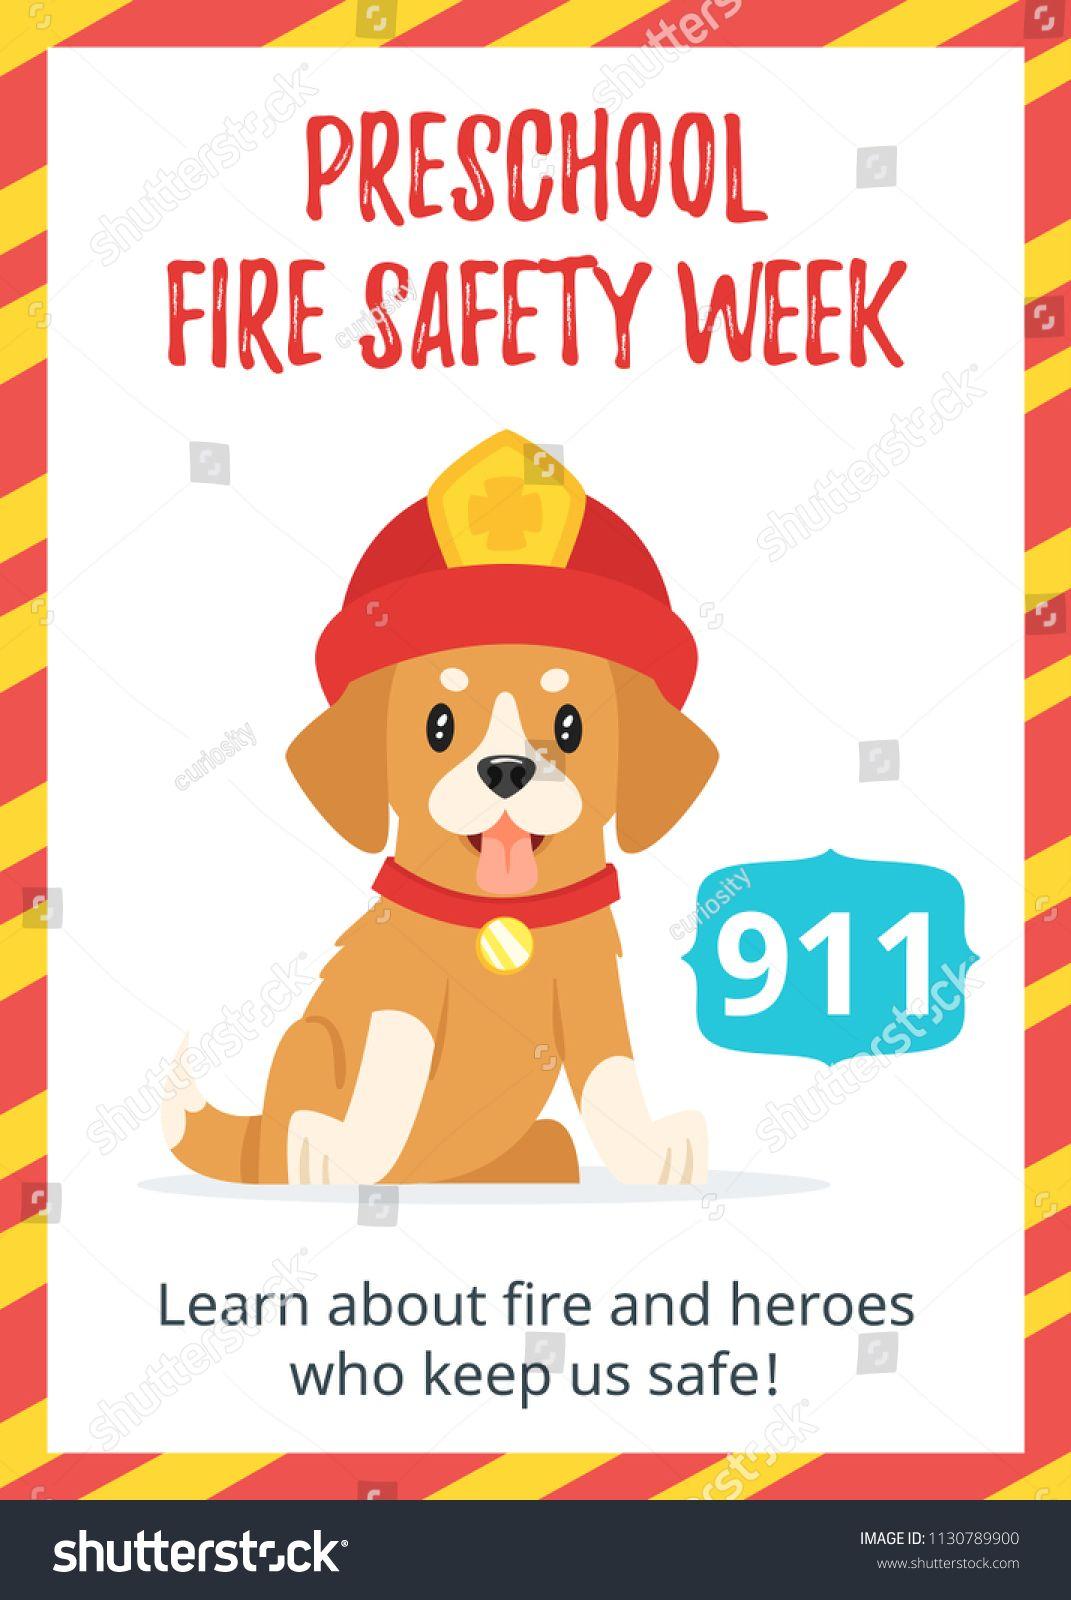 Vector cartoon style template for preschool fire safety